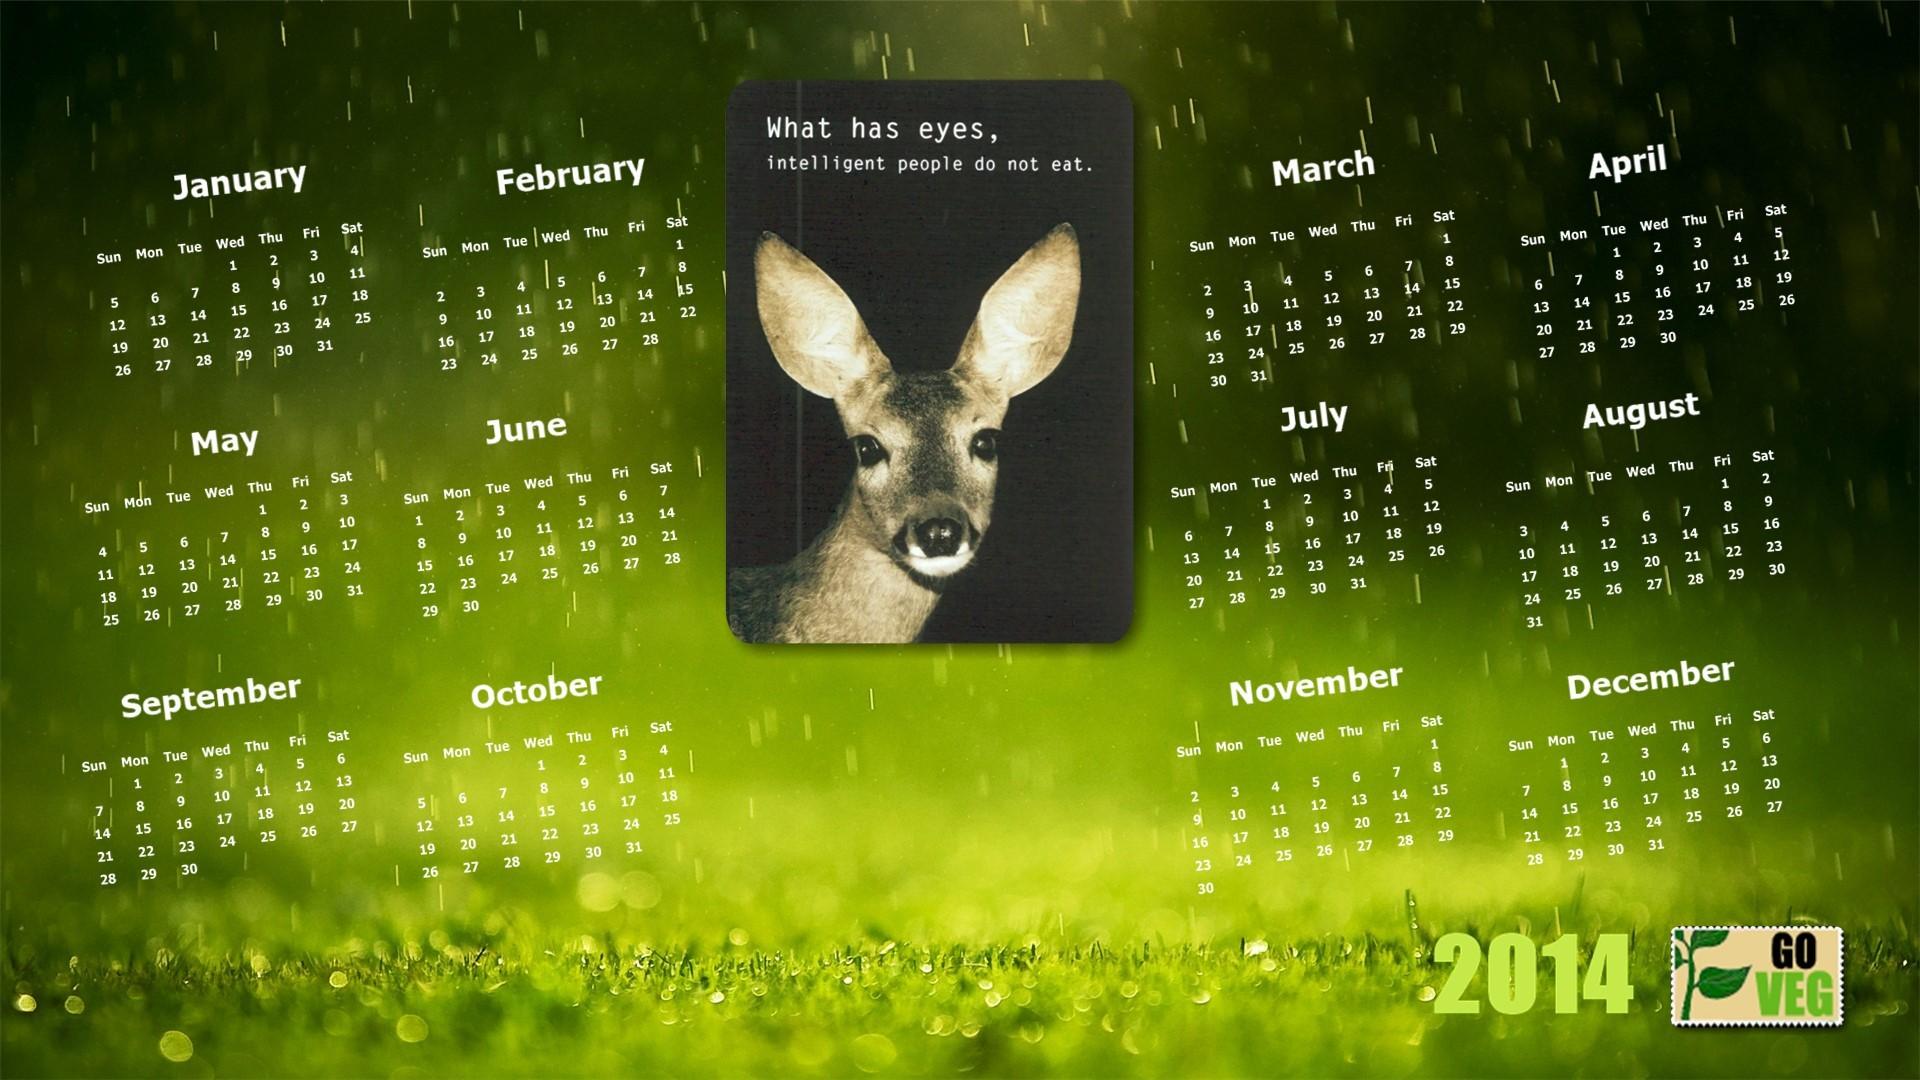 2014 Vegan Calendar wallpapers HD   401218 1920x1080